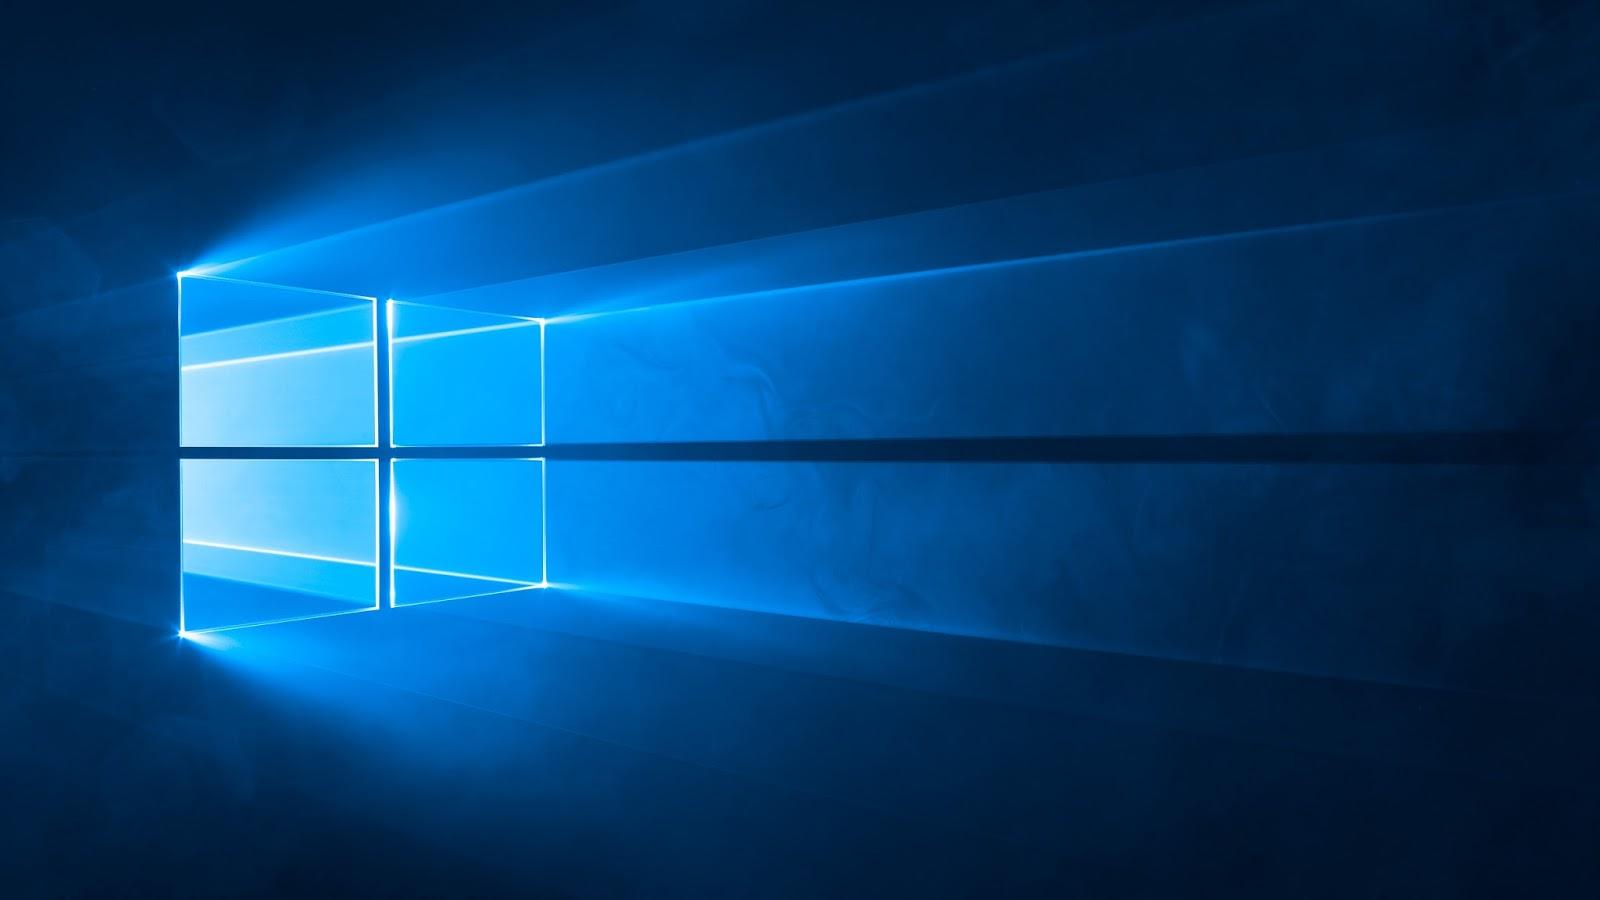 Calendars Microsoft Windows 10 Download wallpaper hd 1600x900